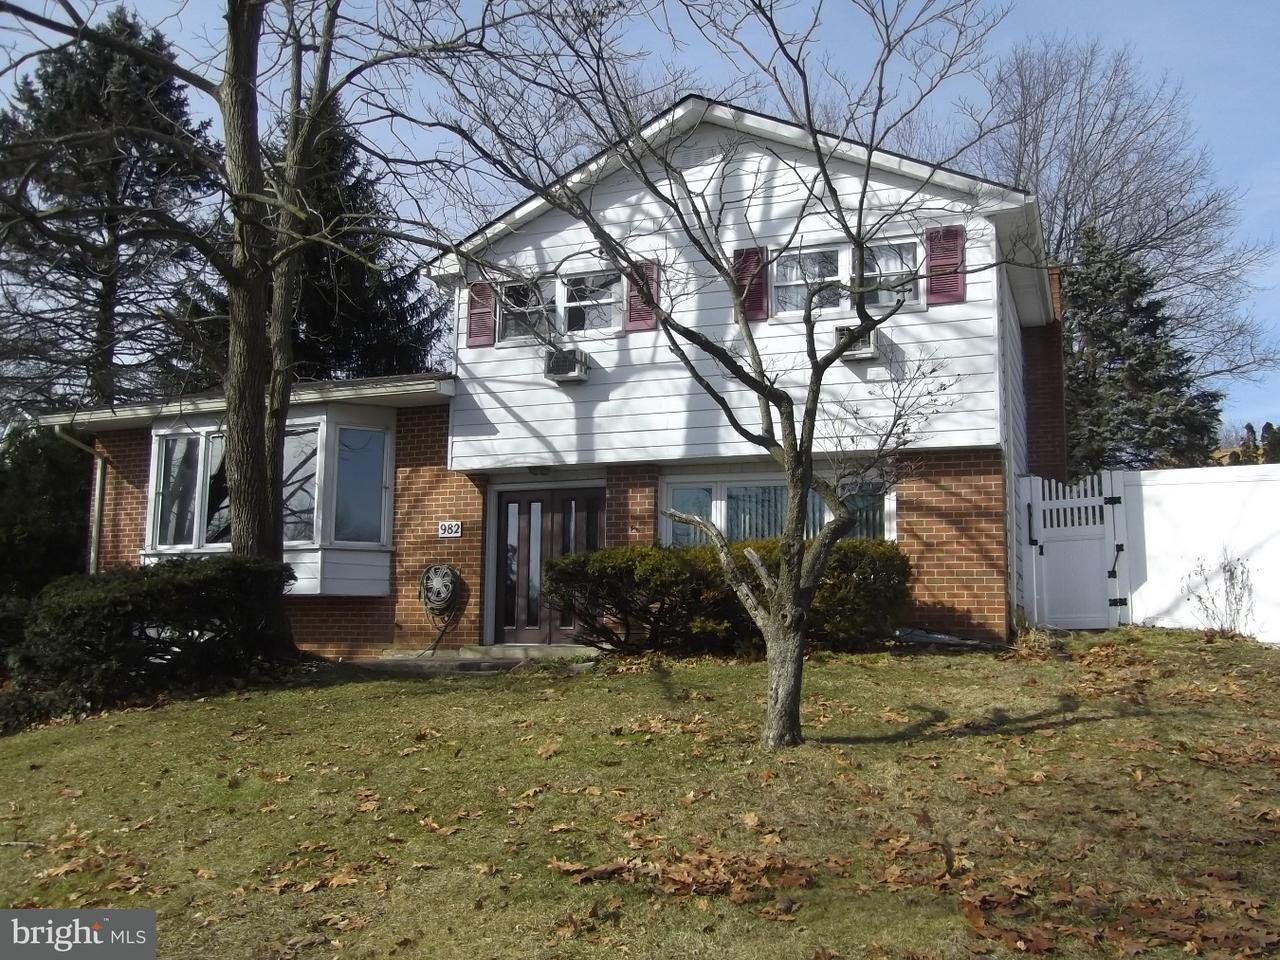 Single Family Home for Sale at 982 BRIDGE Court Catasauqua, Pennsylvania 18032 United States